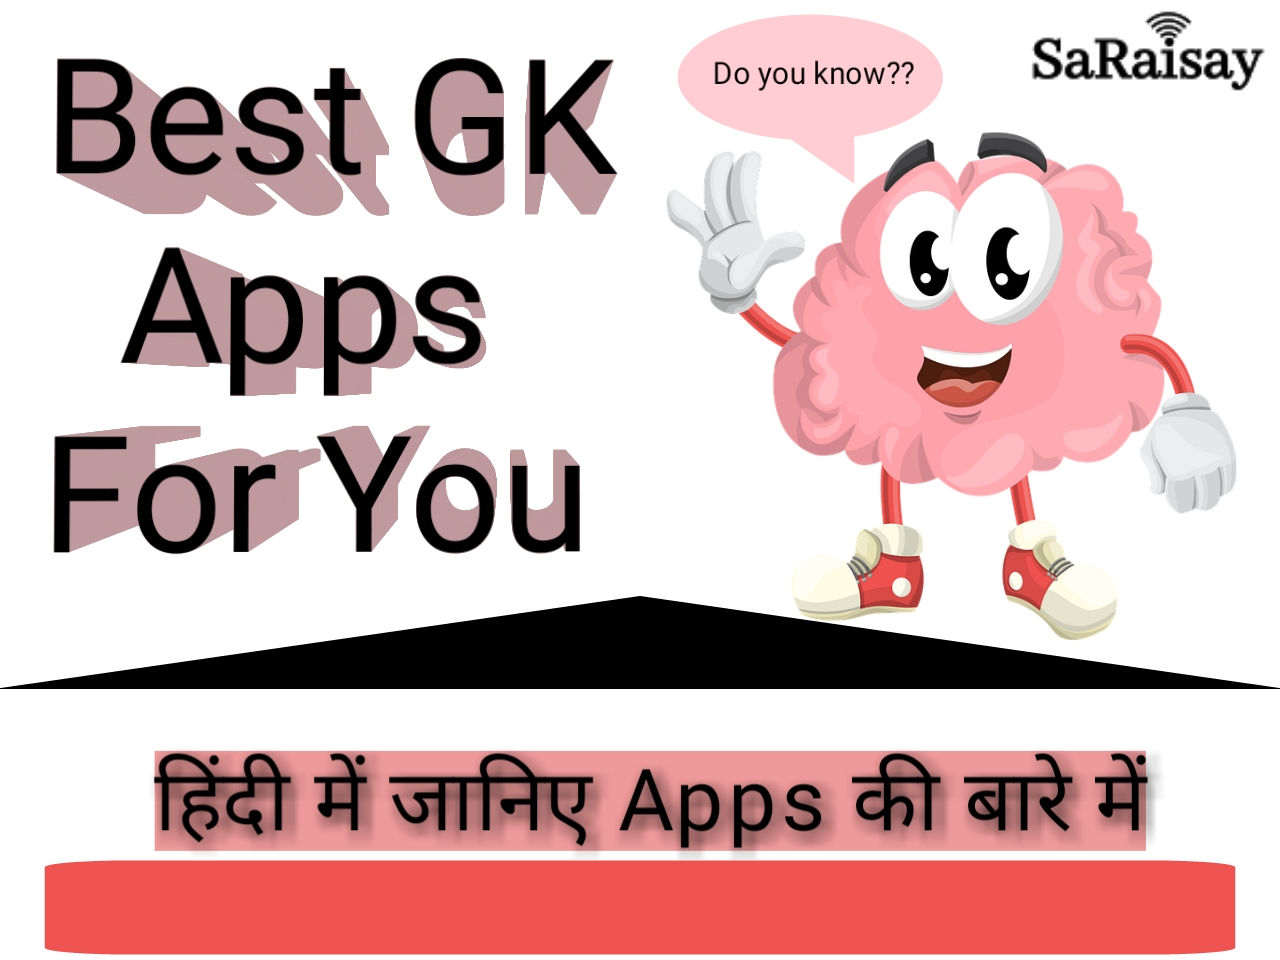 gk app in hindi,gk apps in hindi, gk app in english,gk apps download in hindi,gk hindi apps download,gk hindi apps free download,gk apps hindi me, gk question in hindi app,gk best app in Hindi,gk app download Hindi in 2019,